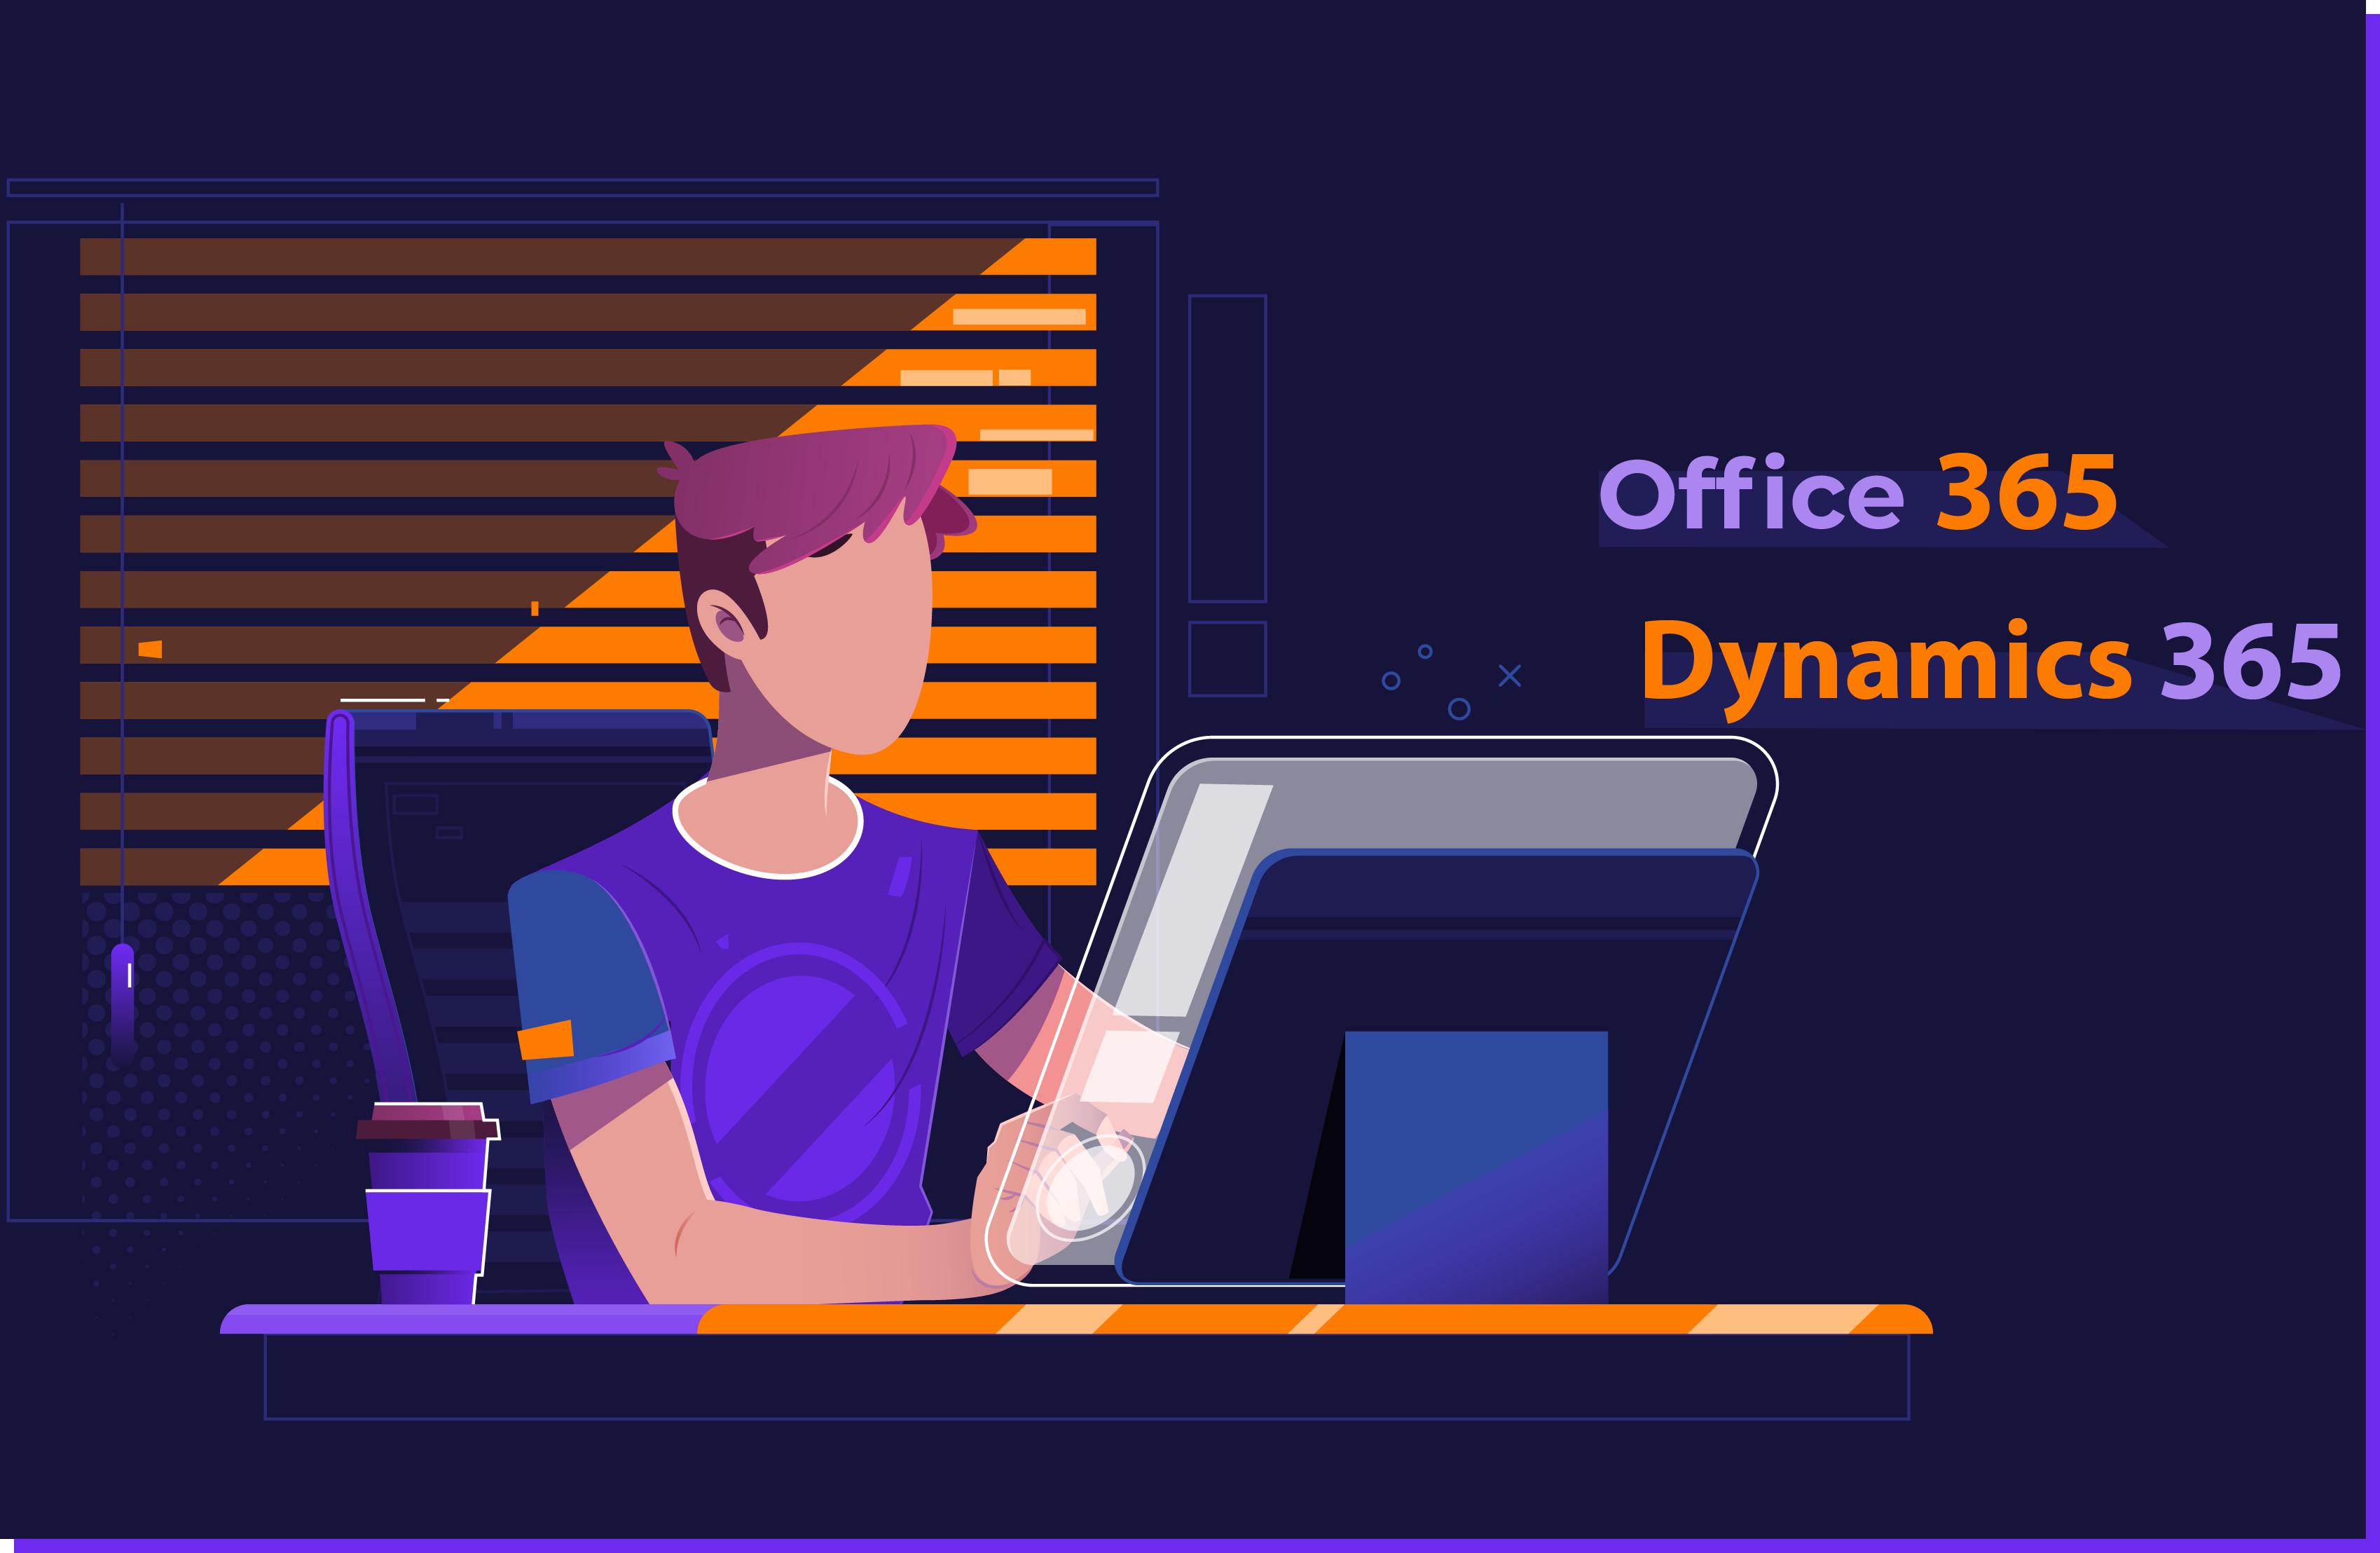 dynamics 365 office 365